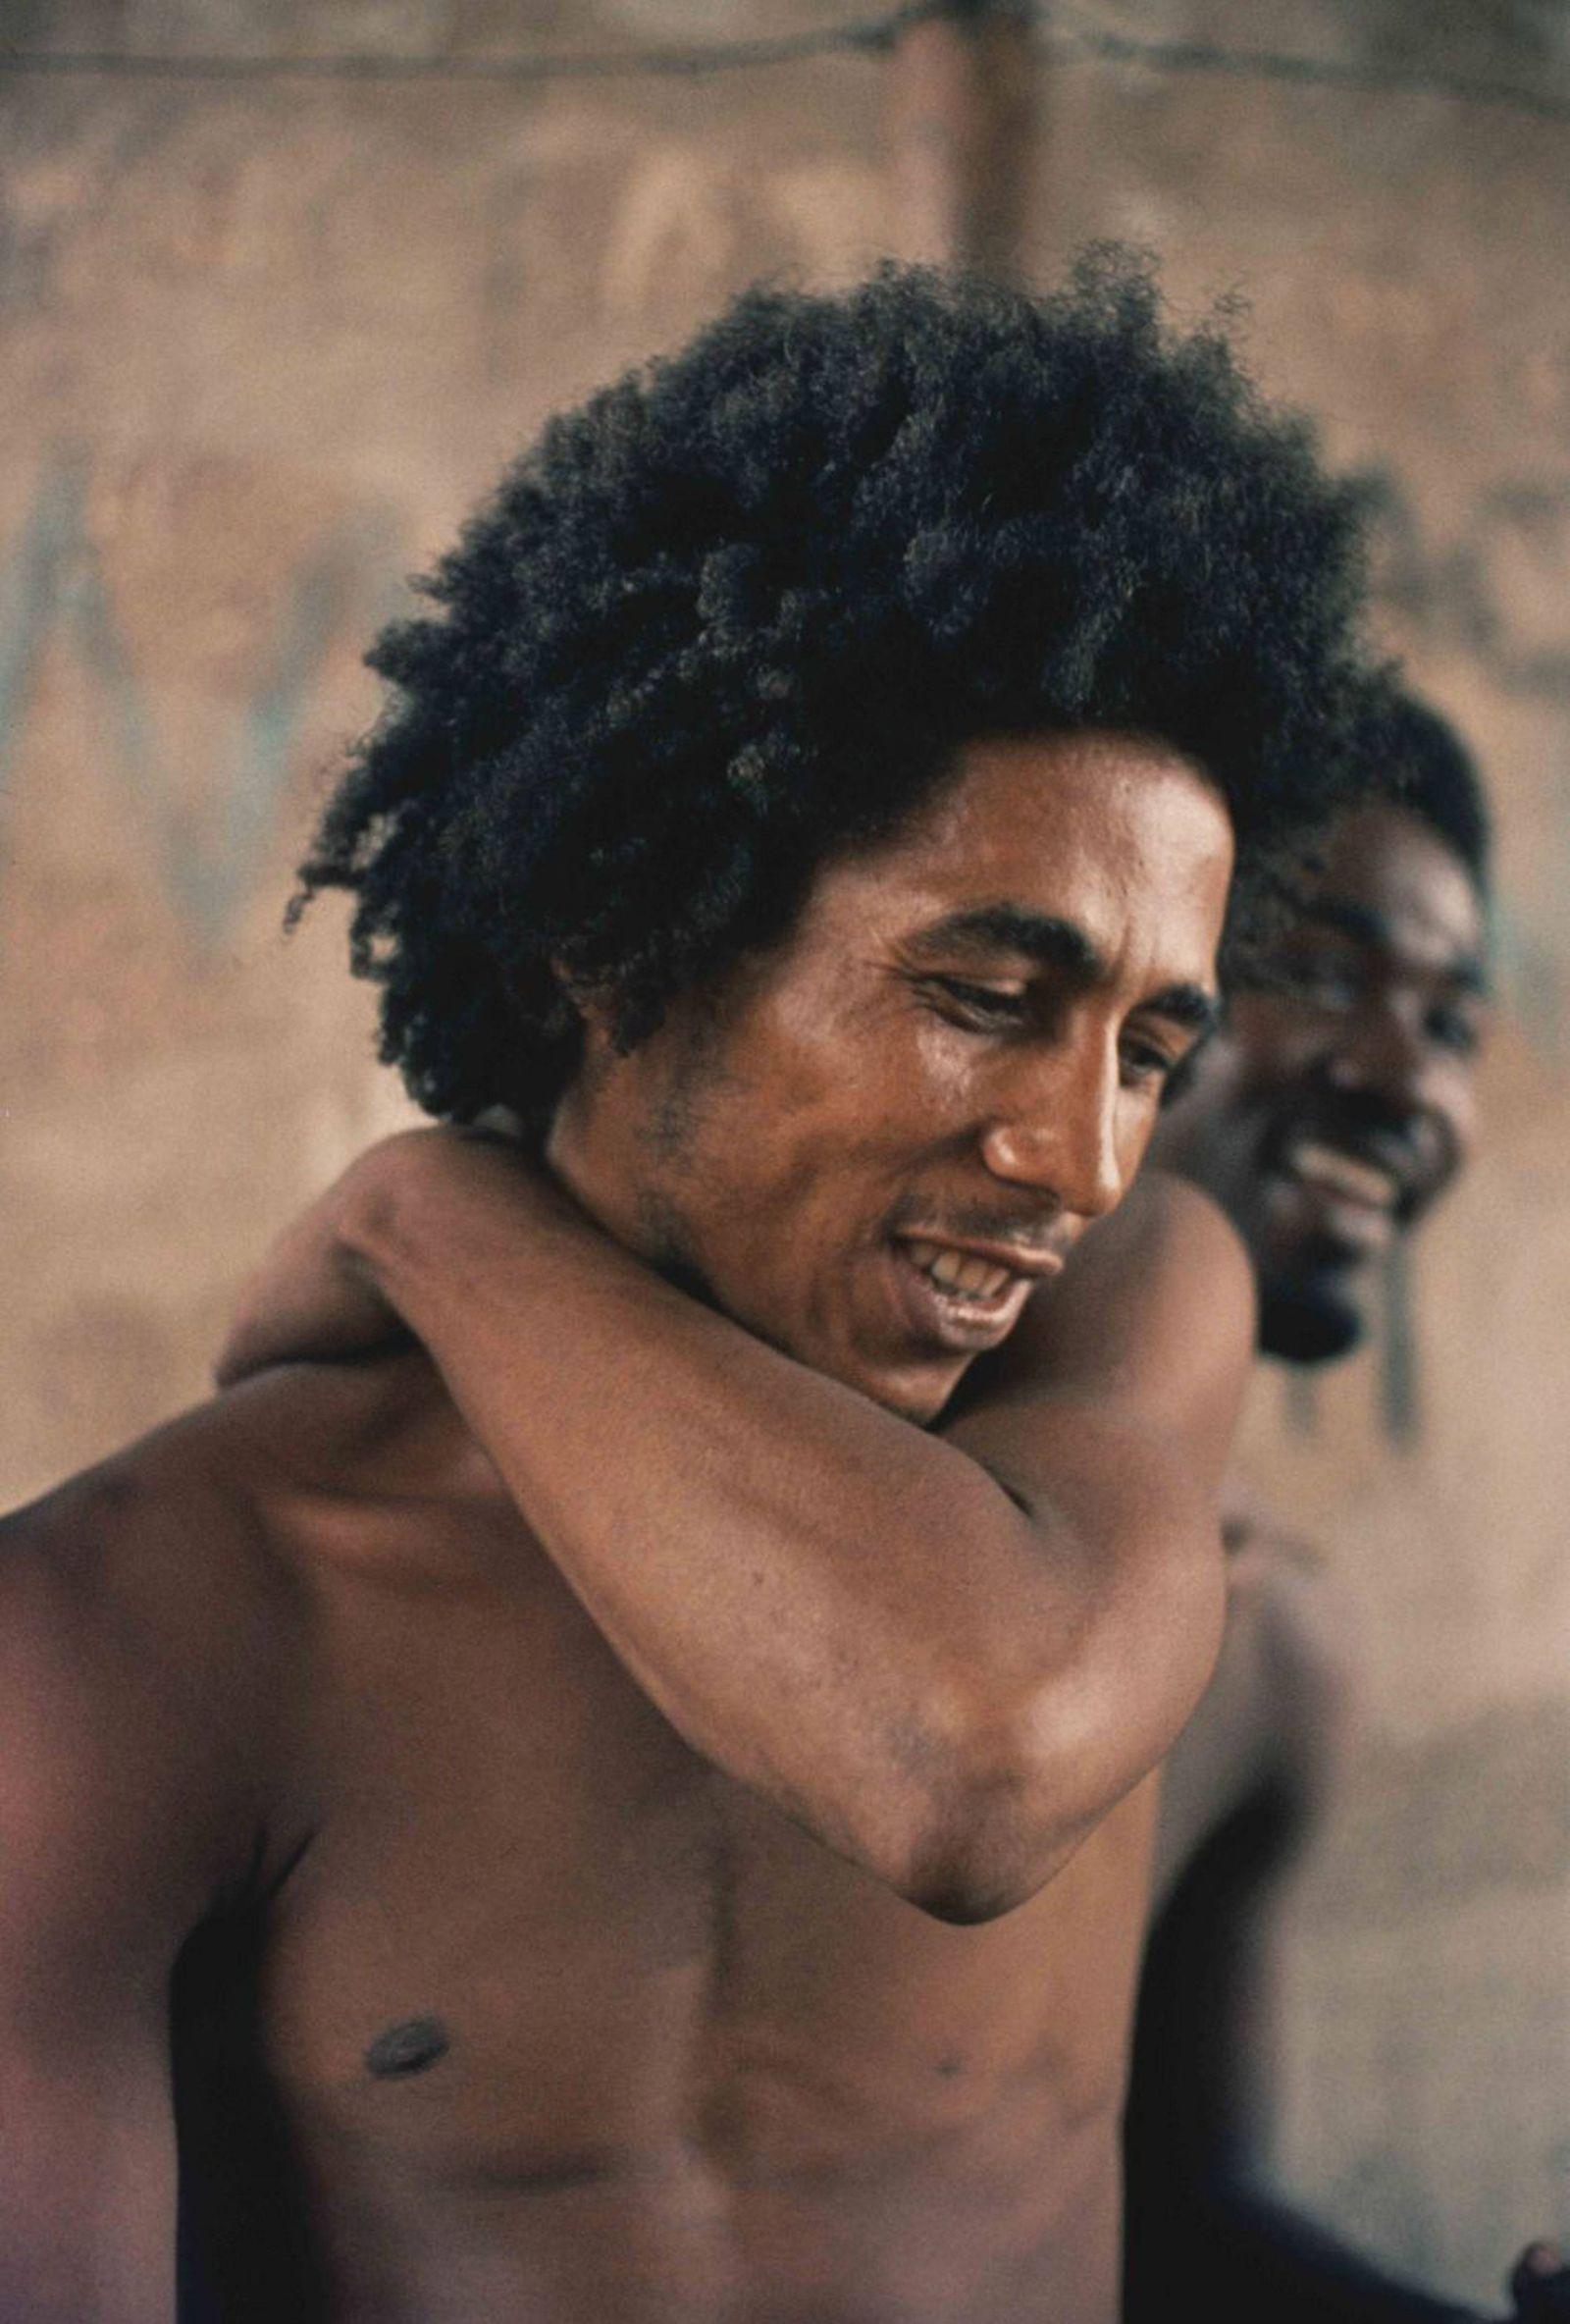 RELEASE DATE: April 20, 2012 MOVIE TITLE: Marley aka Bob Marley: Roots of Legend STUDIO: Magnolia Pi